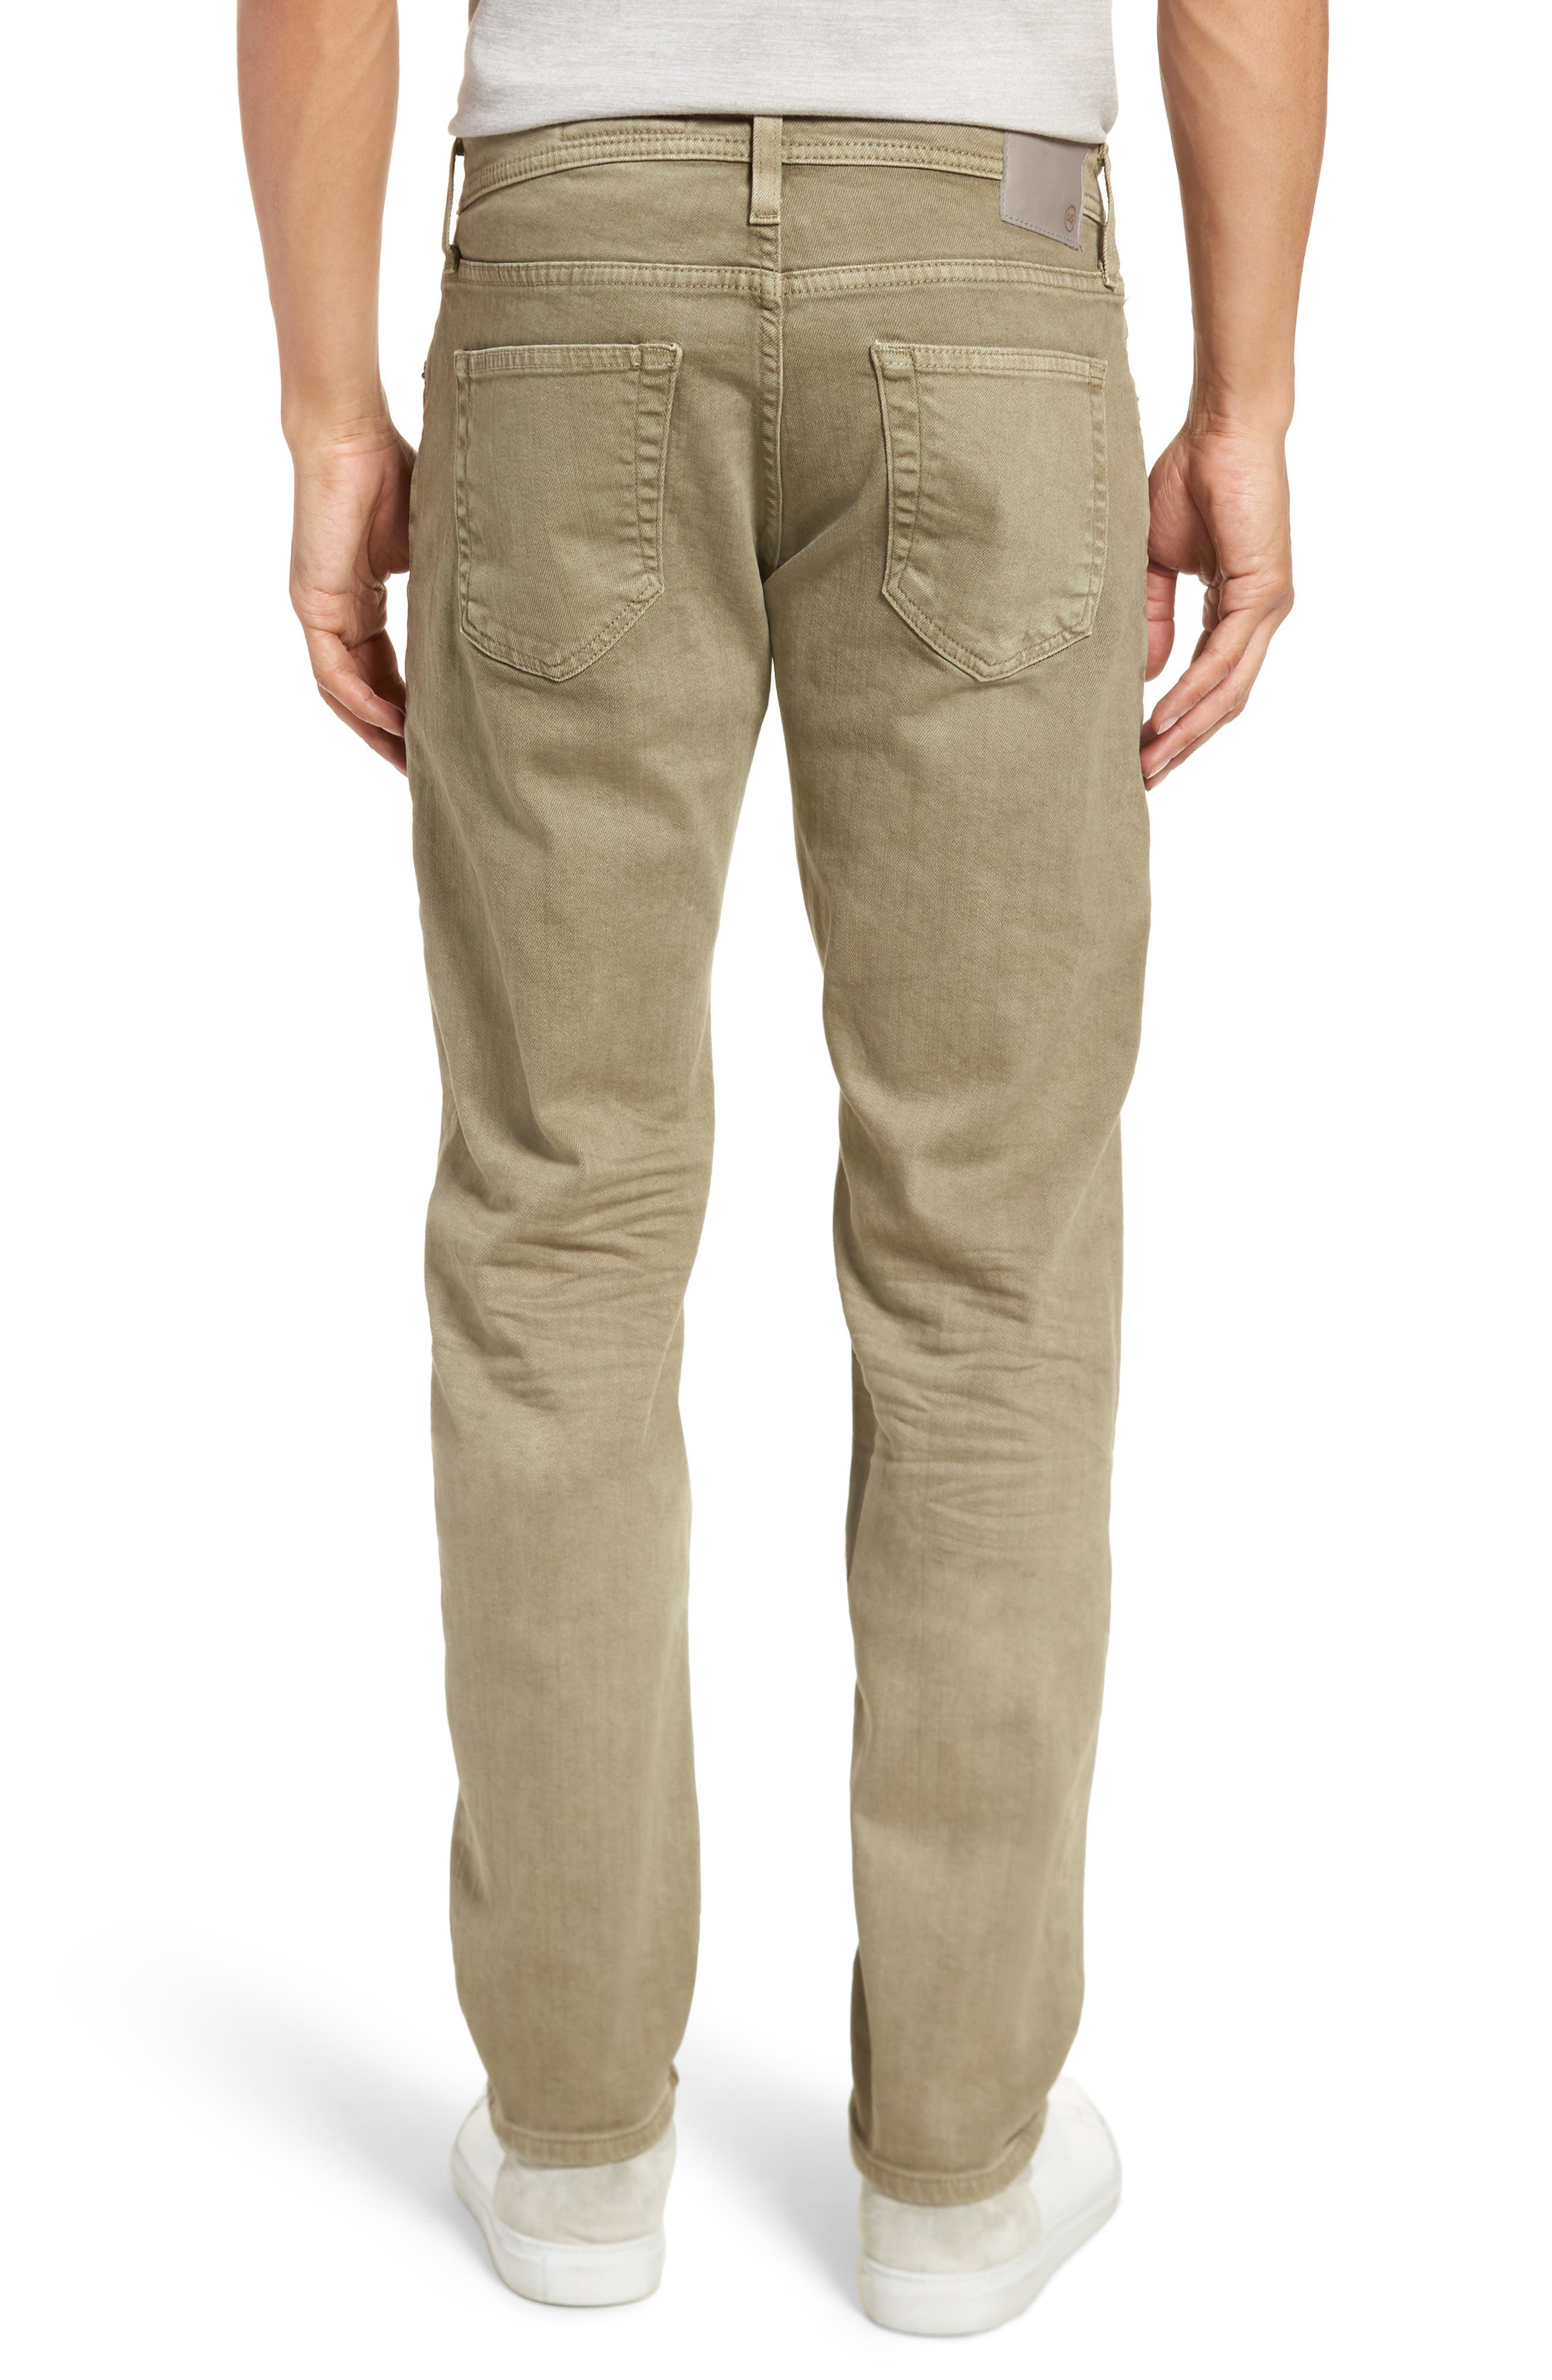 Tellis Slim Fit Jeans,                             Alternate thumbnail 2, color,                             316